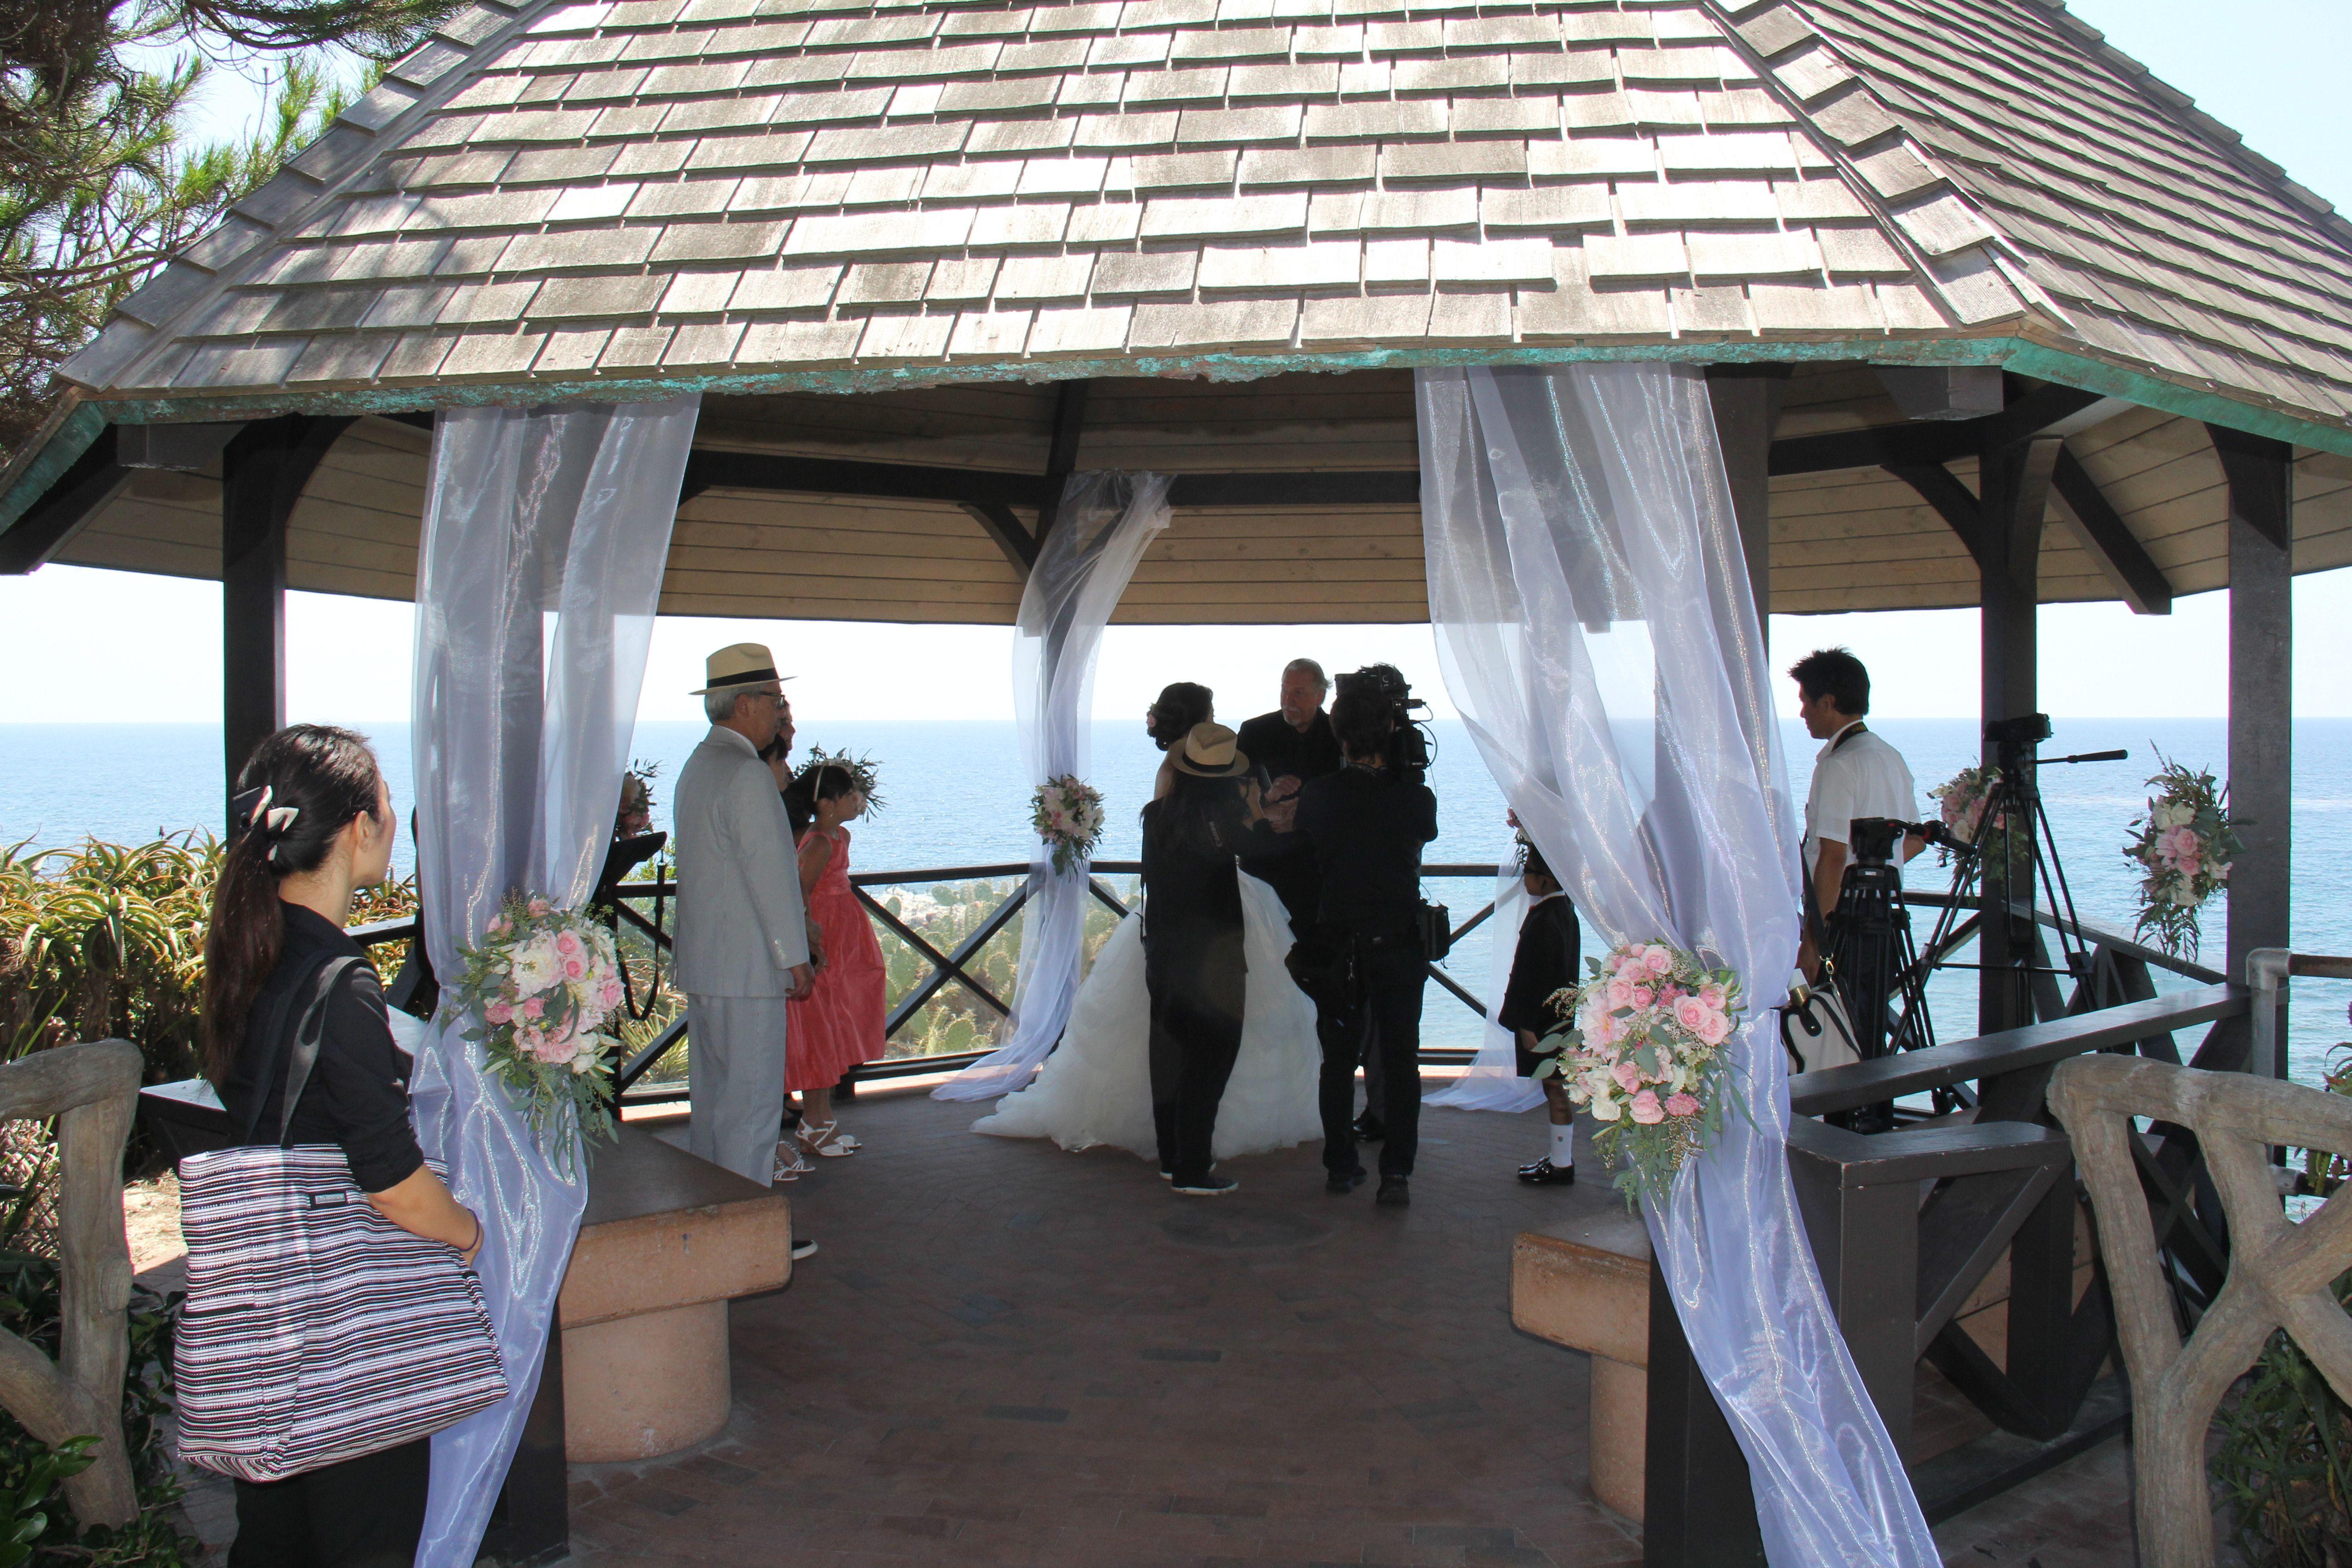 City of laguna beach wedding permits wedding venues